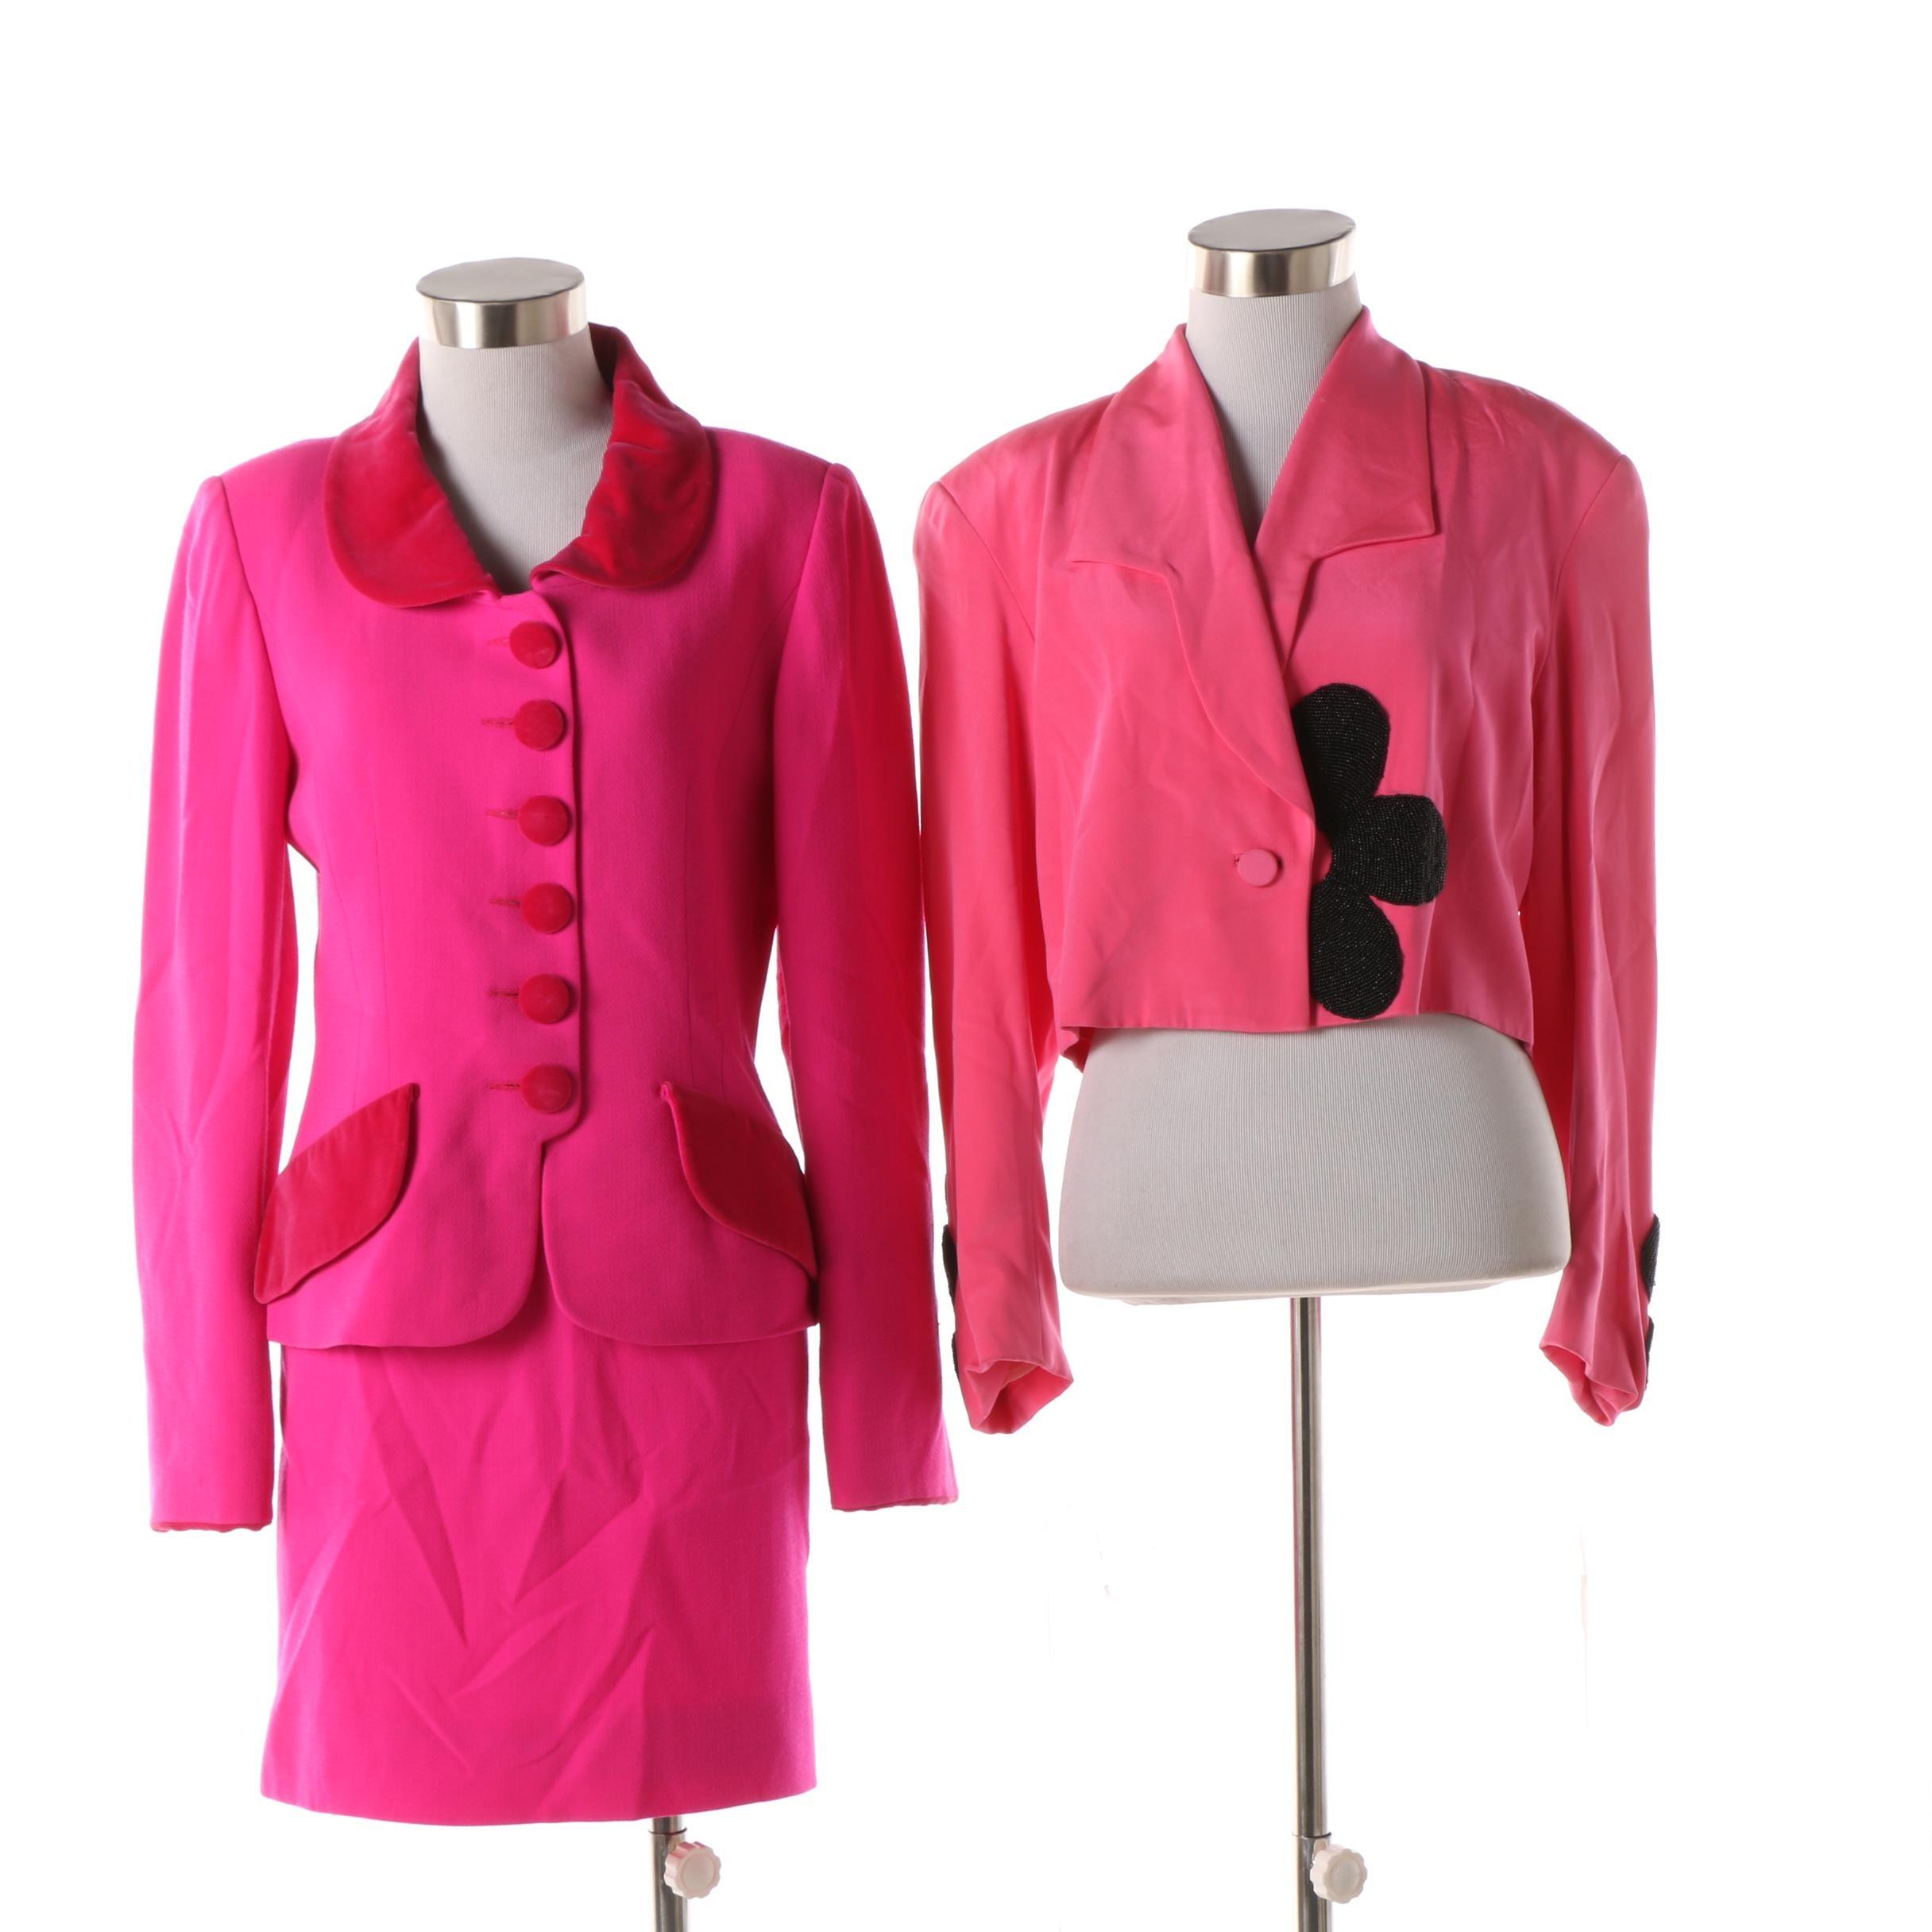 1980s Nina Ricci Edition Boutique Paris Skirt Suit with Rita Mildred Silk Jacket